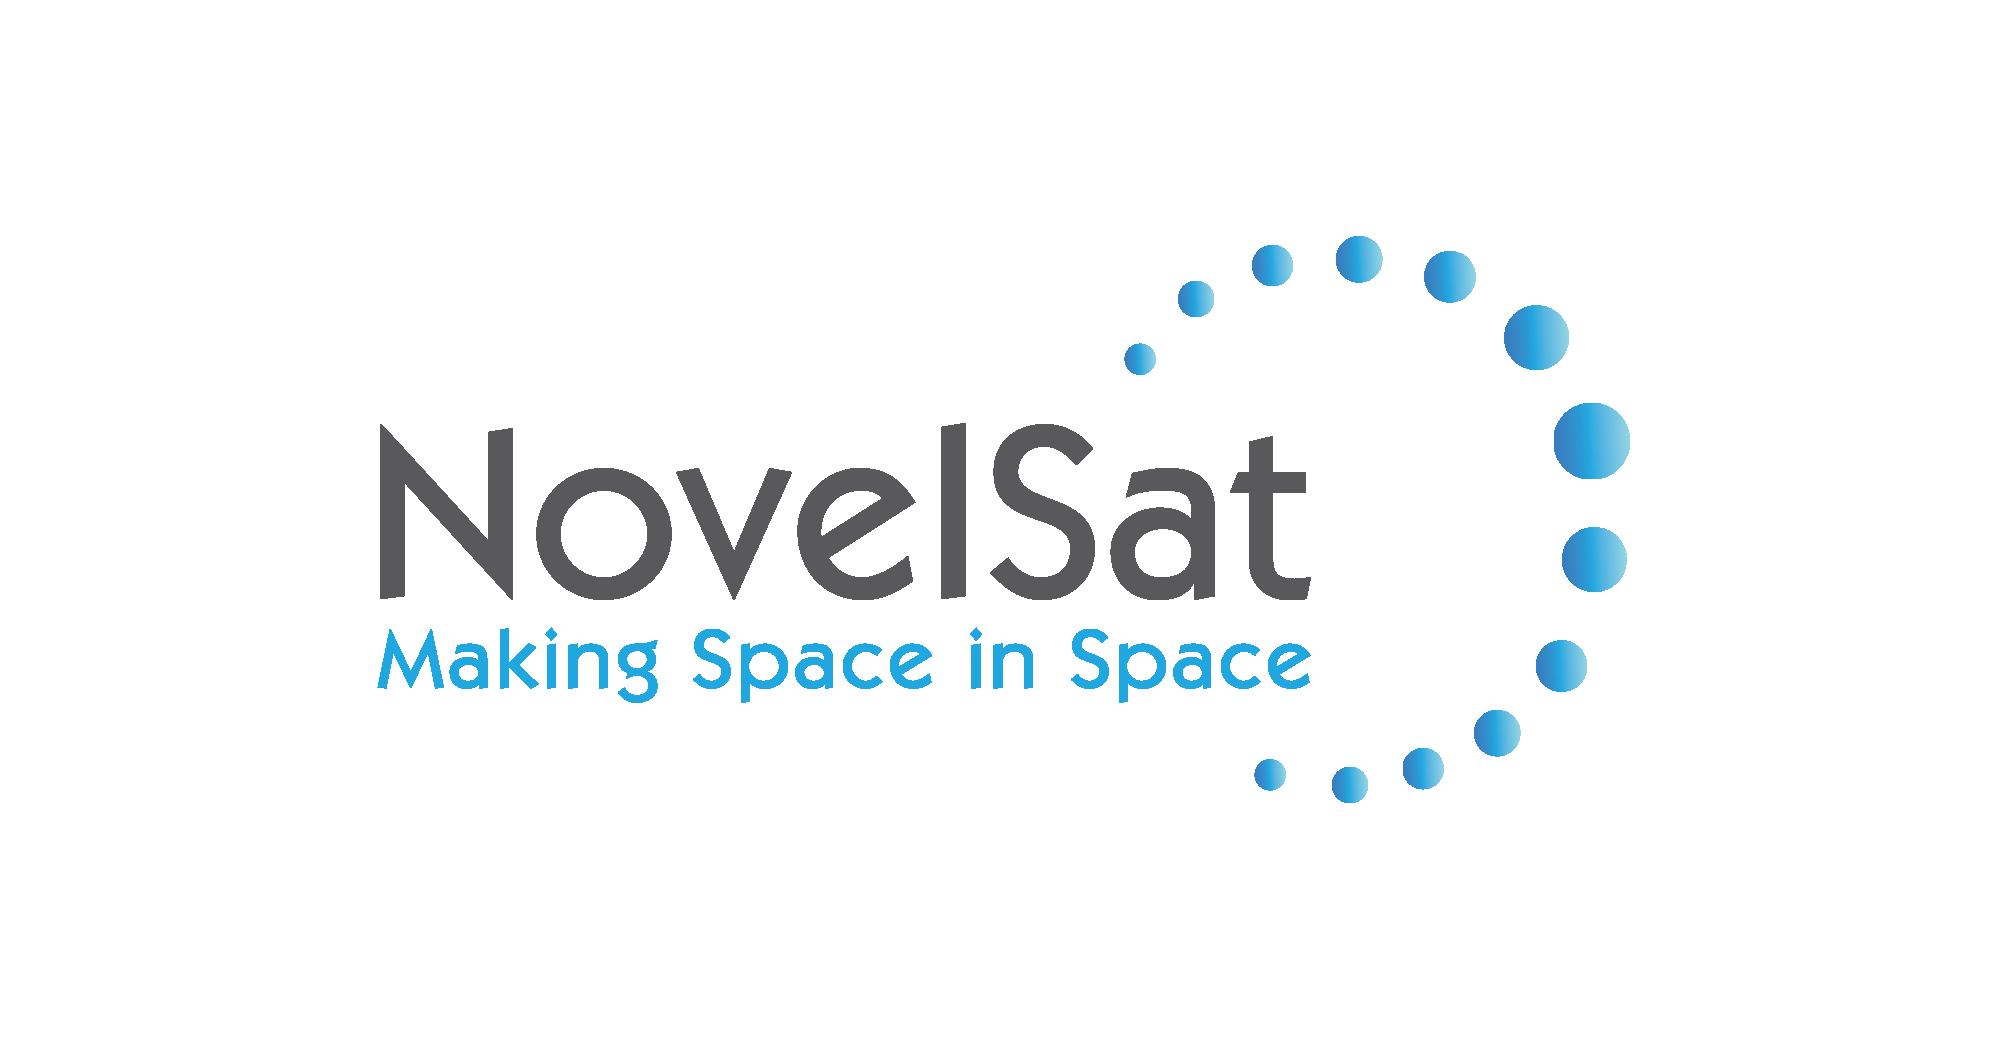 Novelsat